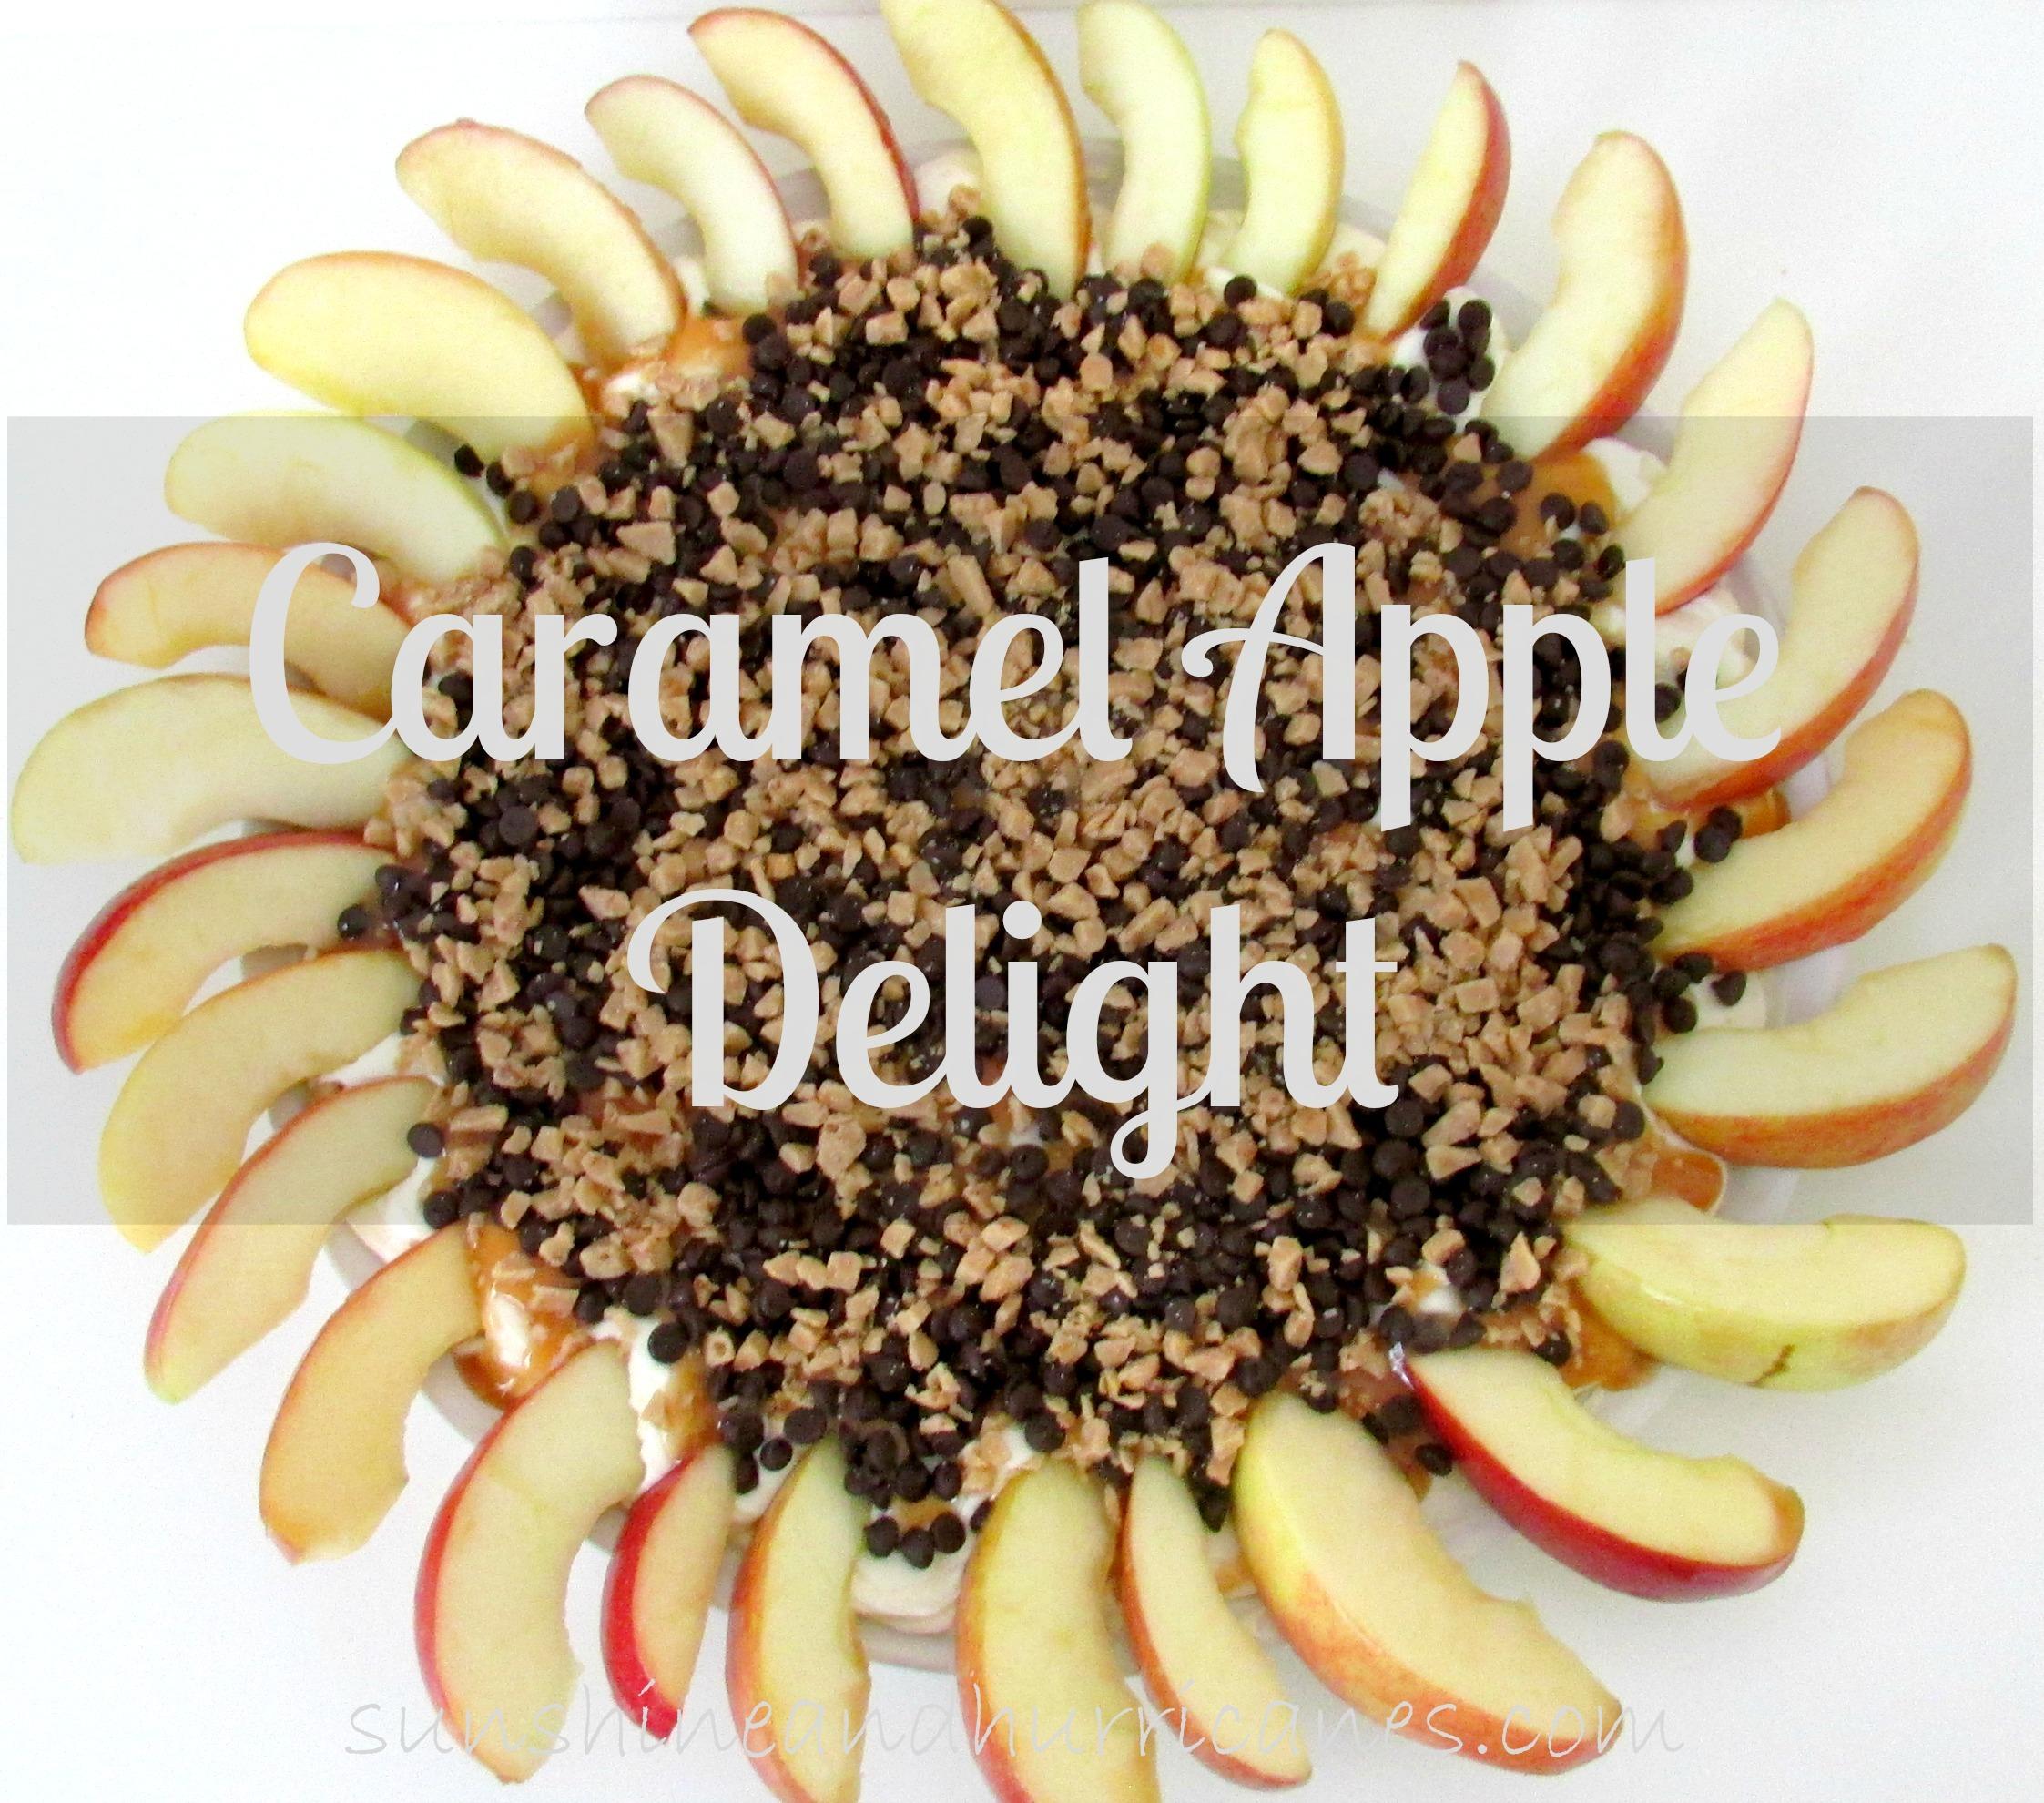 Caramel Apple Delight delicious Fall dessert